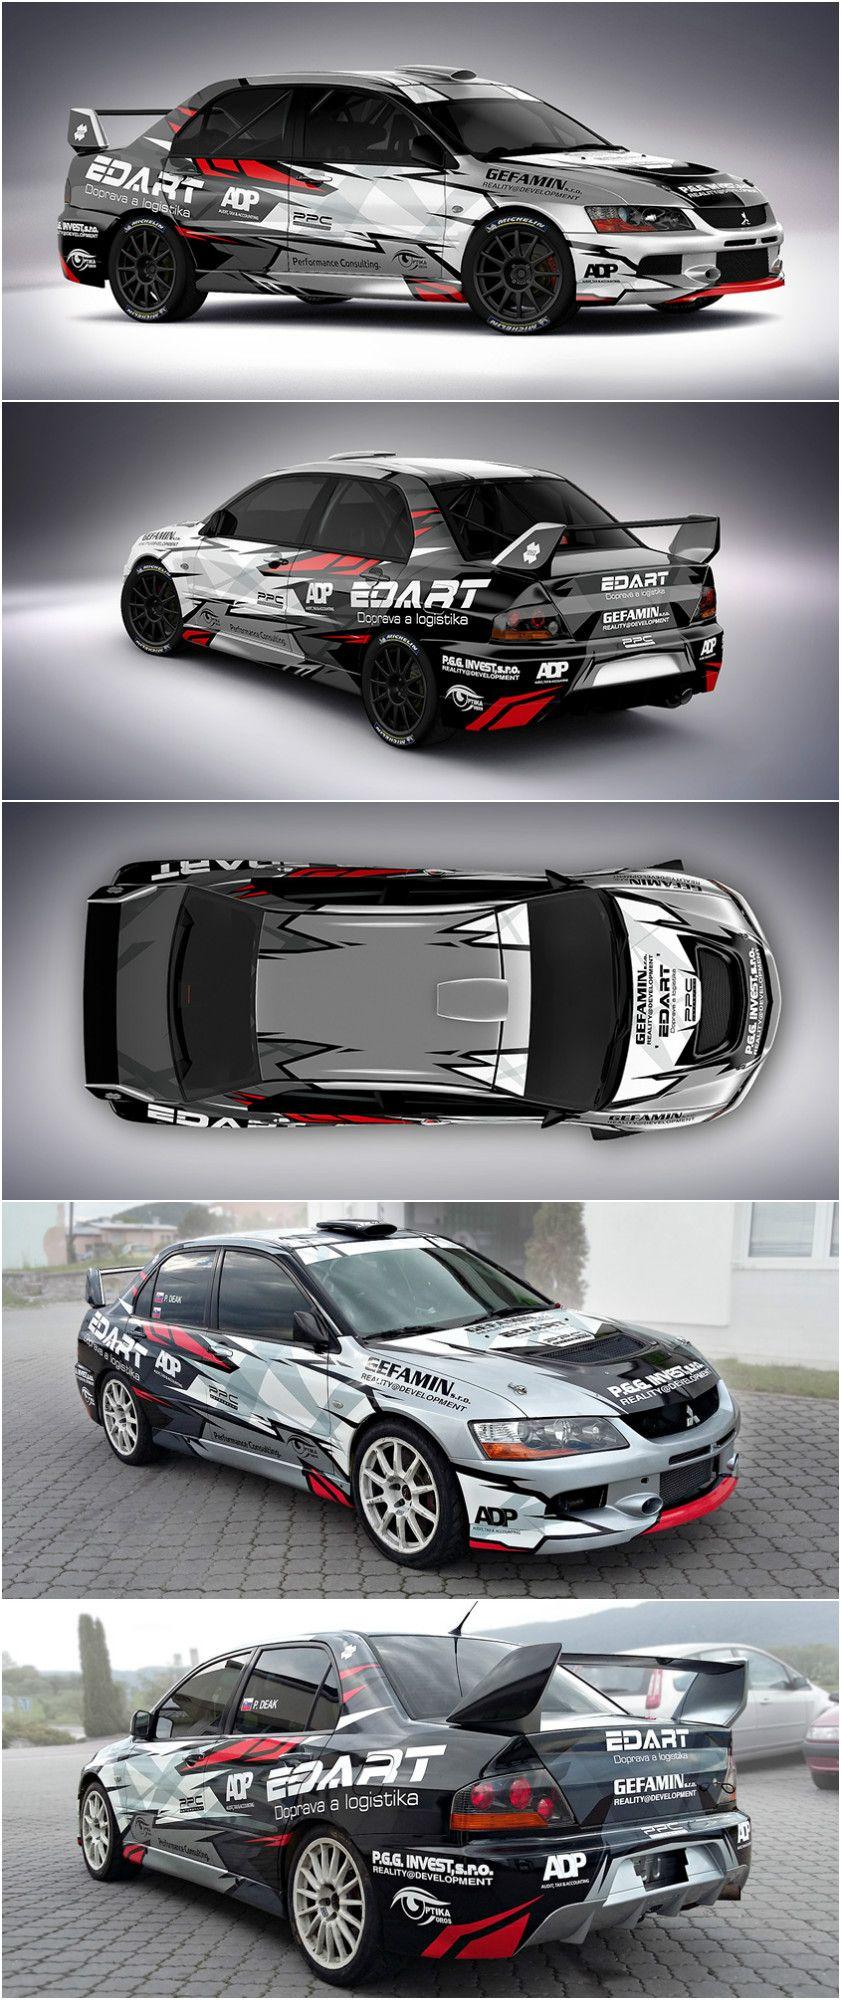 Viva car sticker design - Design And Wrap Of Mitsubishi Lancer Evo Ix For Slovak Xiqio Racing Team